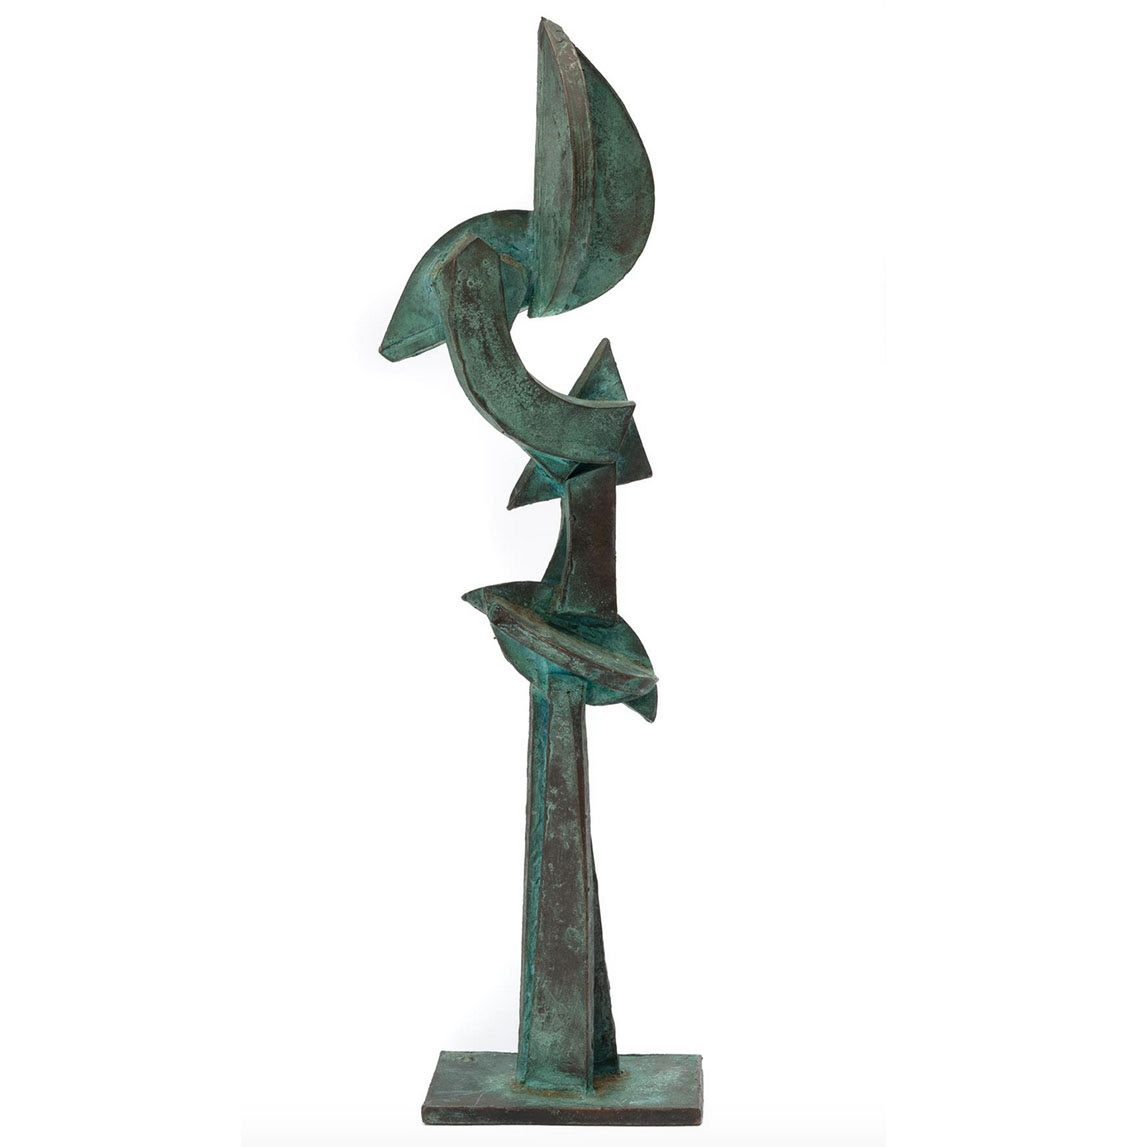 Lot 5. ROBERT KLIPPEL Opus 487, bronze